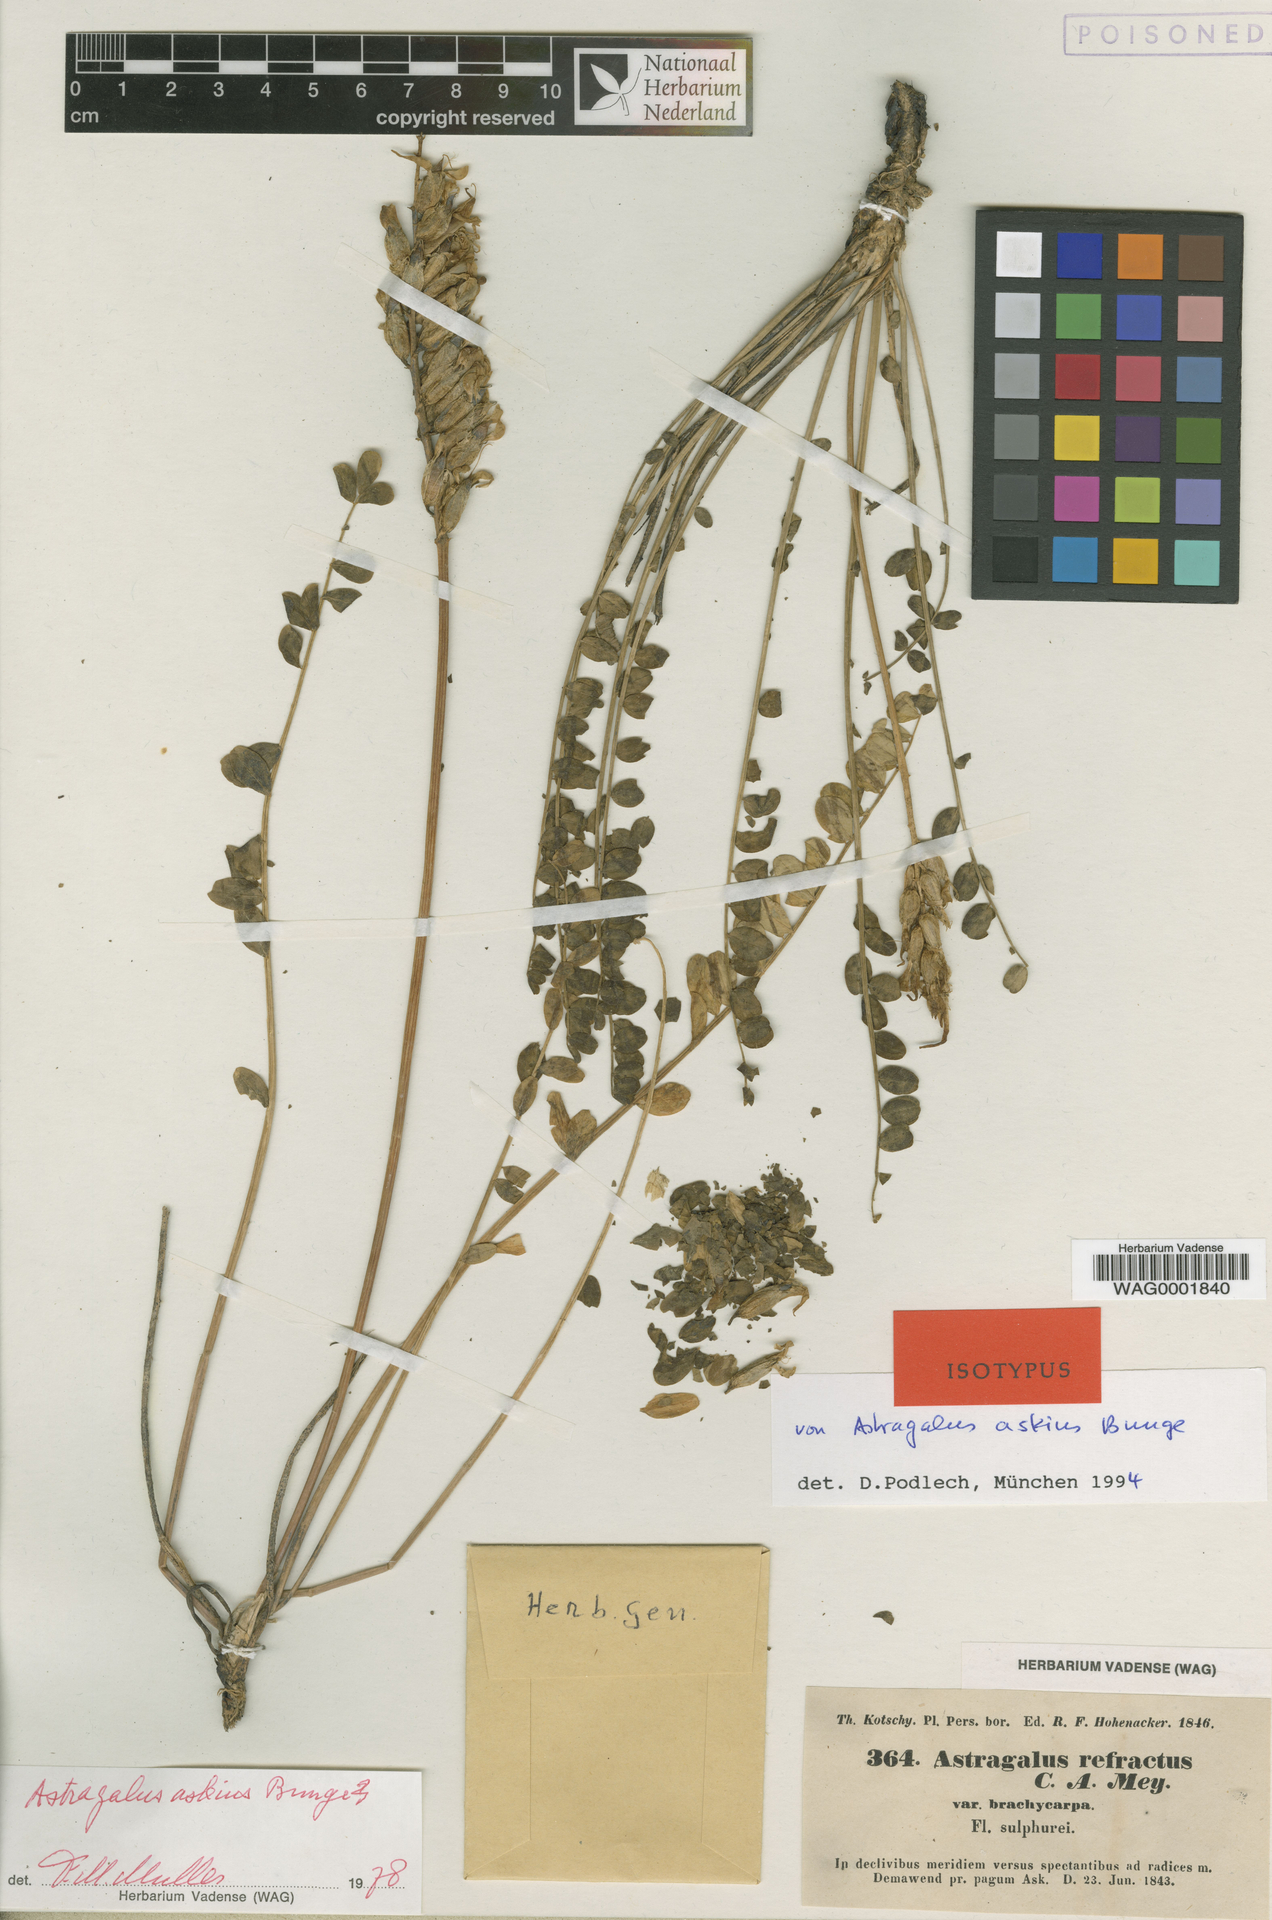 WAG0001840 | Astragalus askius Bunge